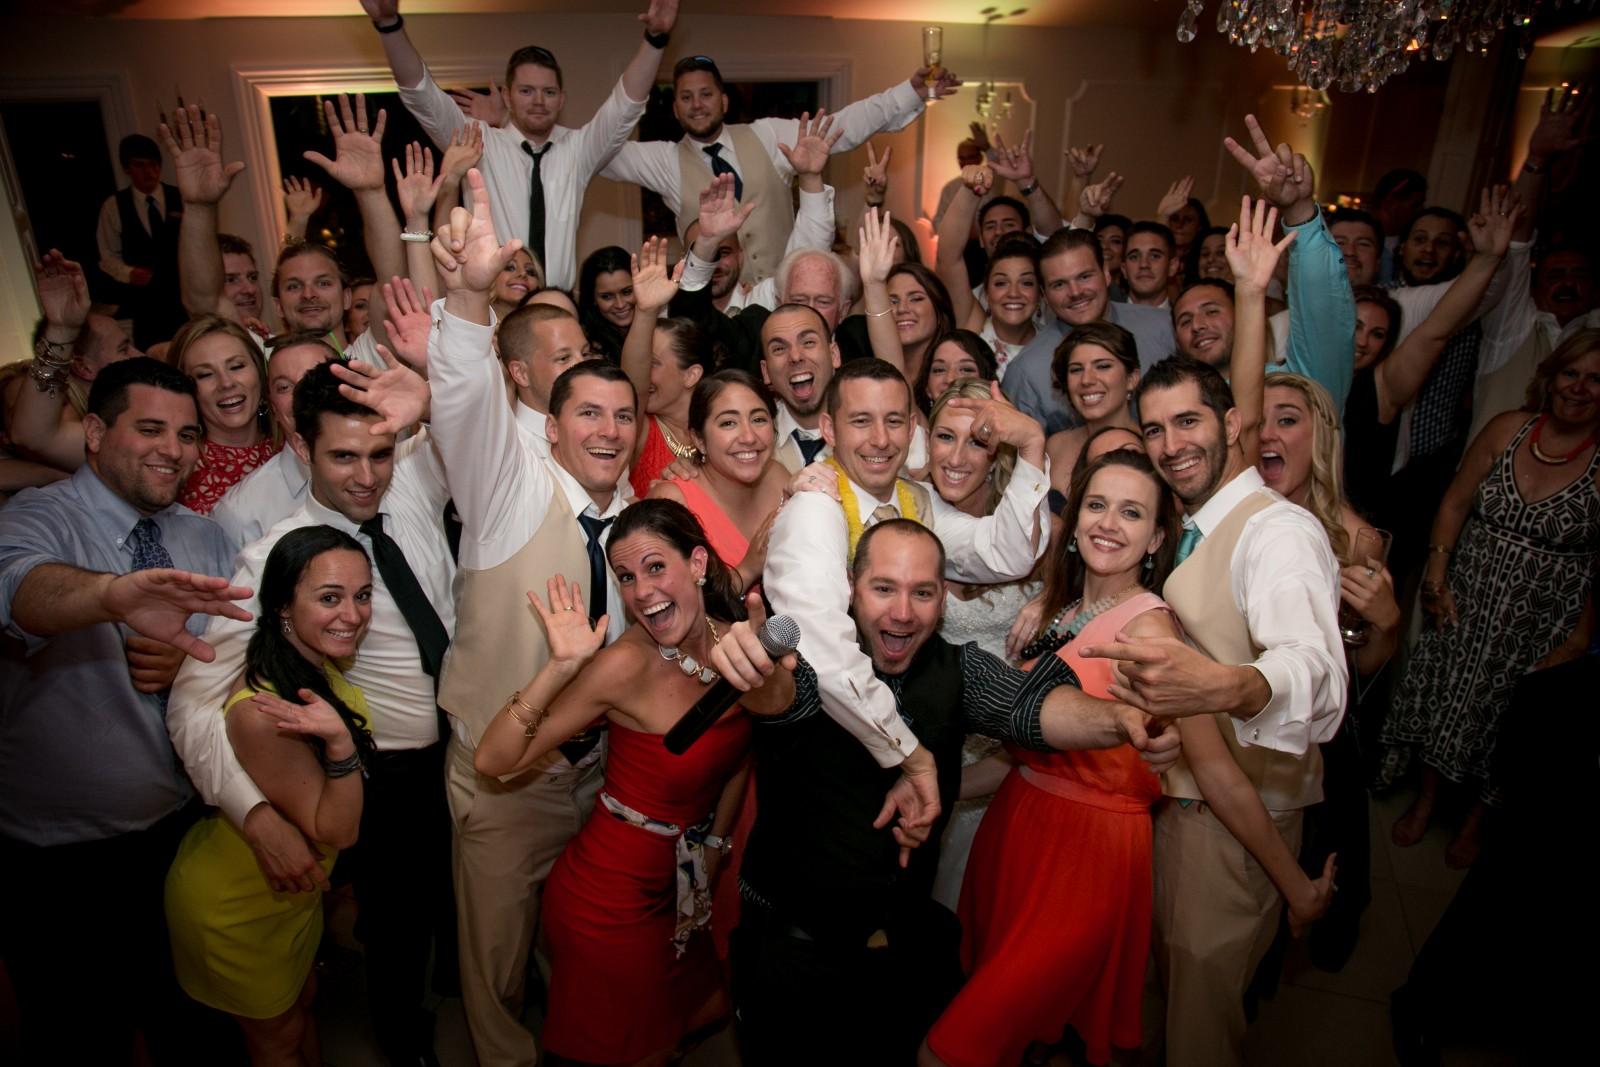 Louisville djs wedding